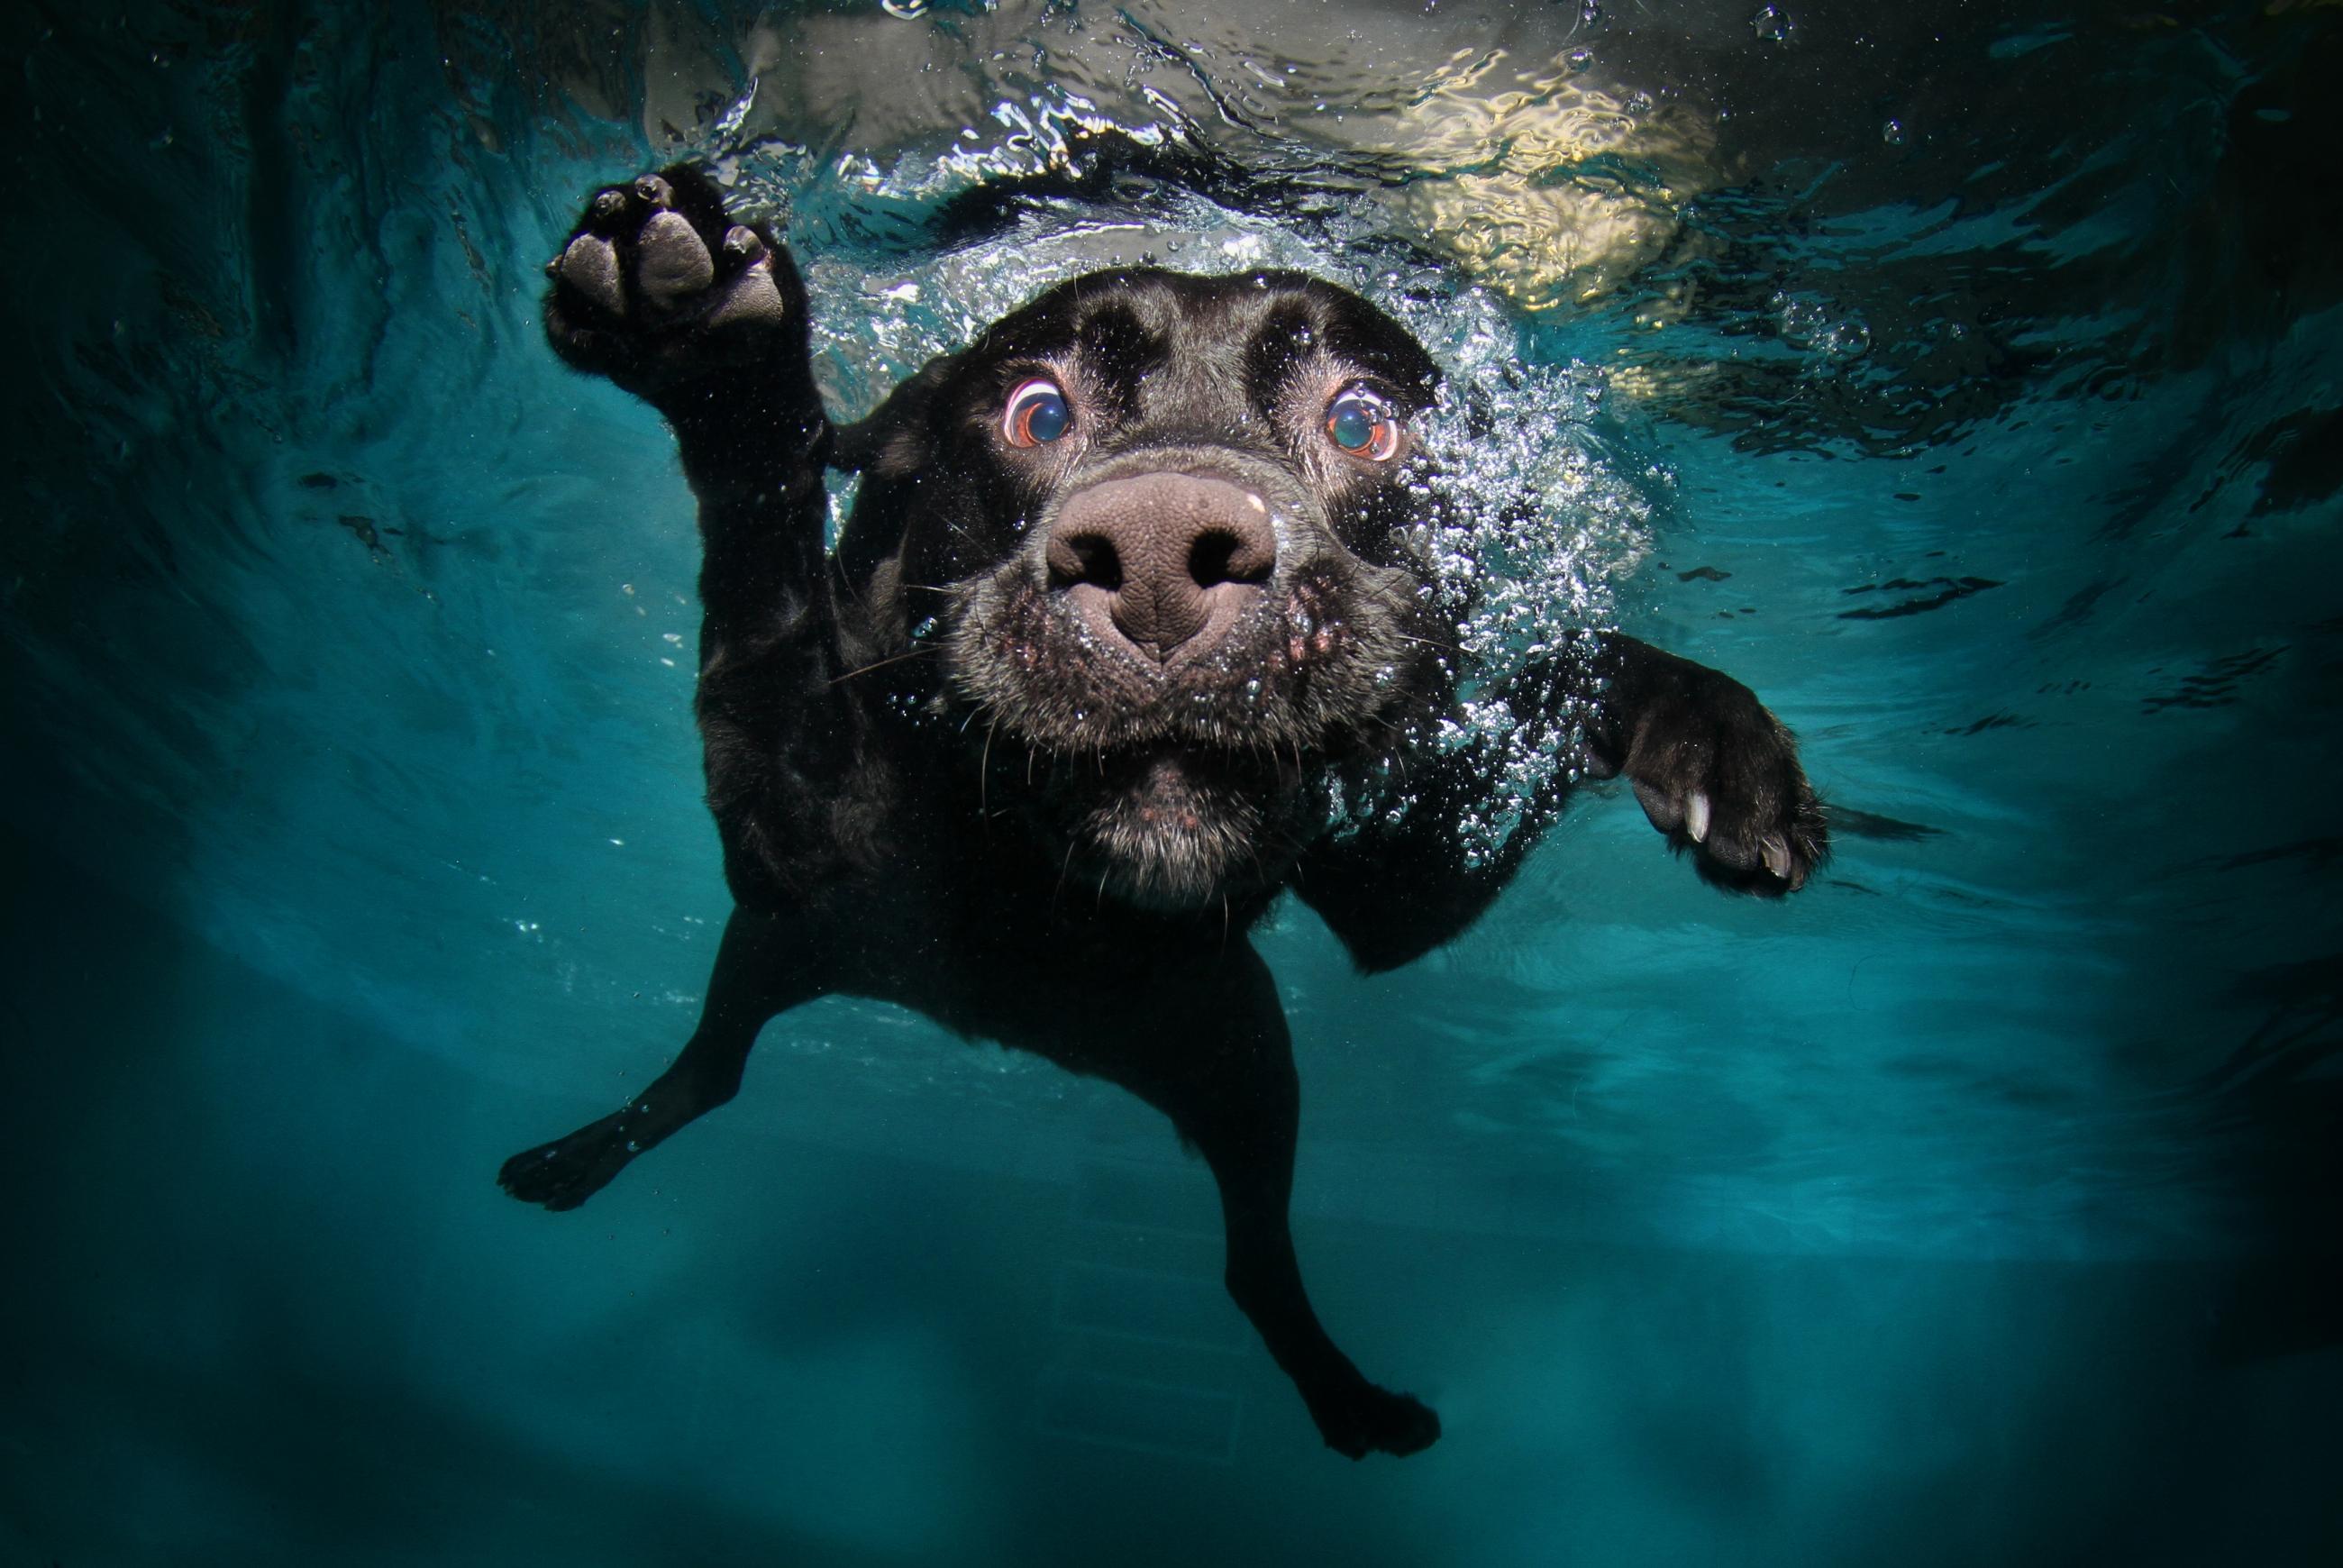 Puppies And Fall Wallpaper 30 Wonderful Black Labrador Retriever